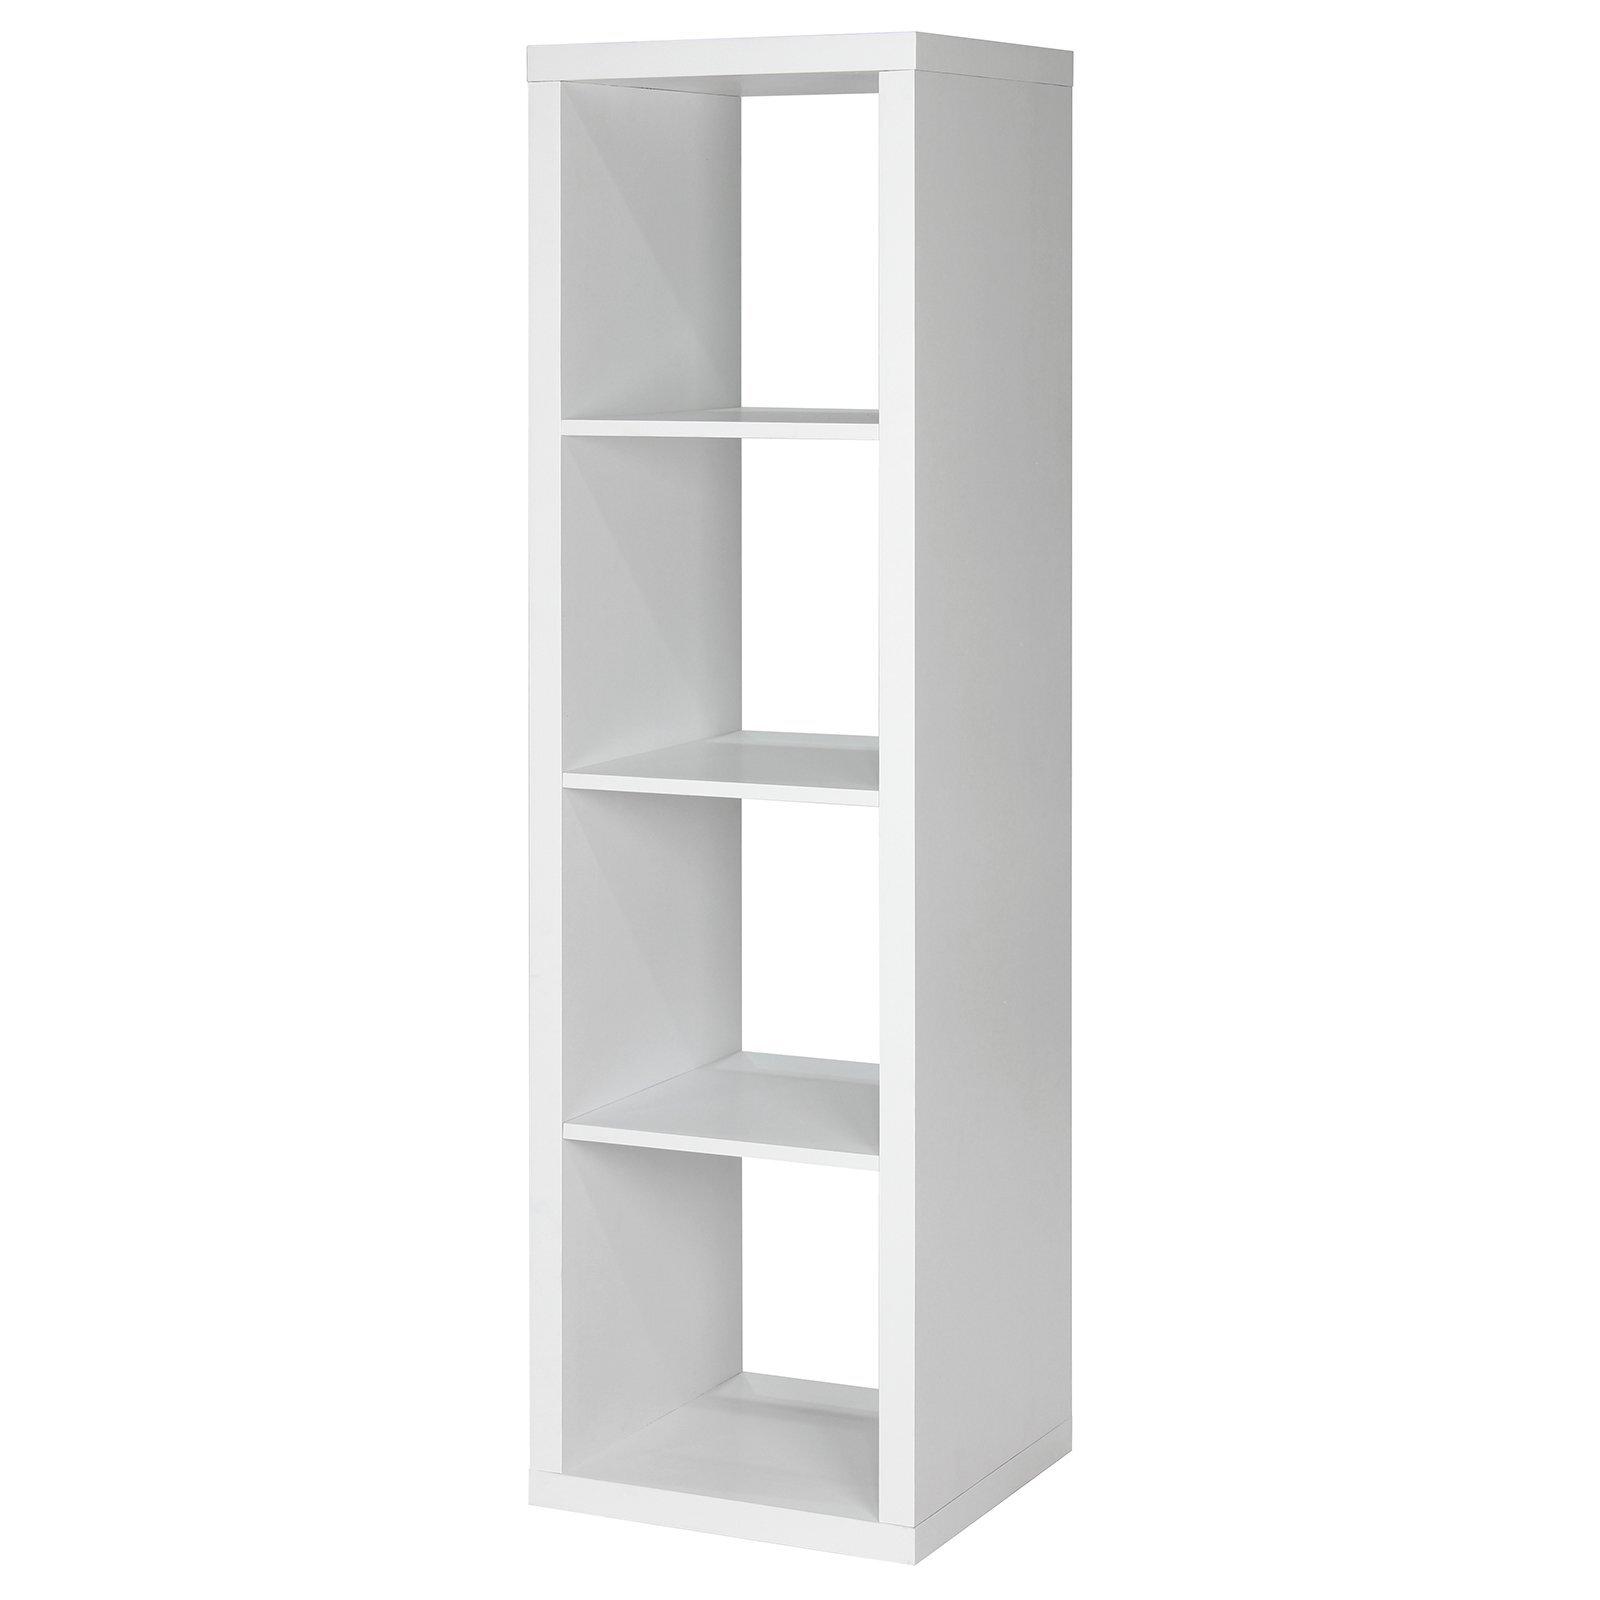 Flexi Storage Clever Cube 1 x 4 Storage Unit - White